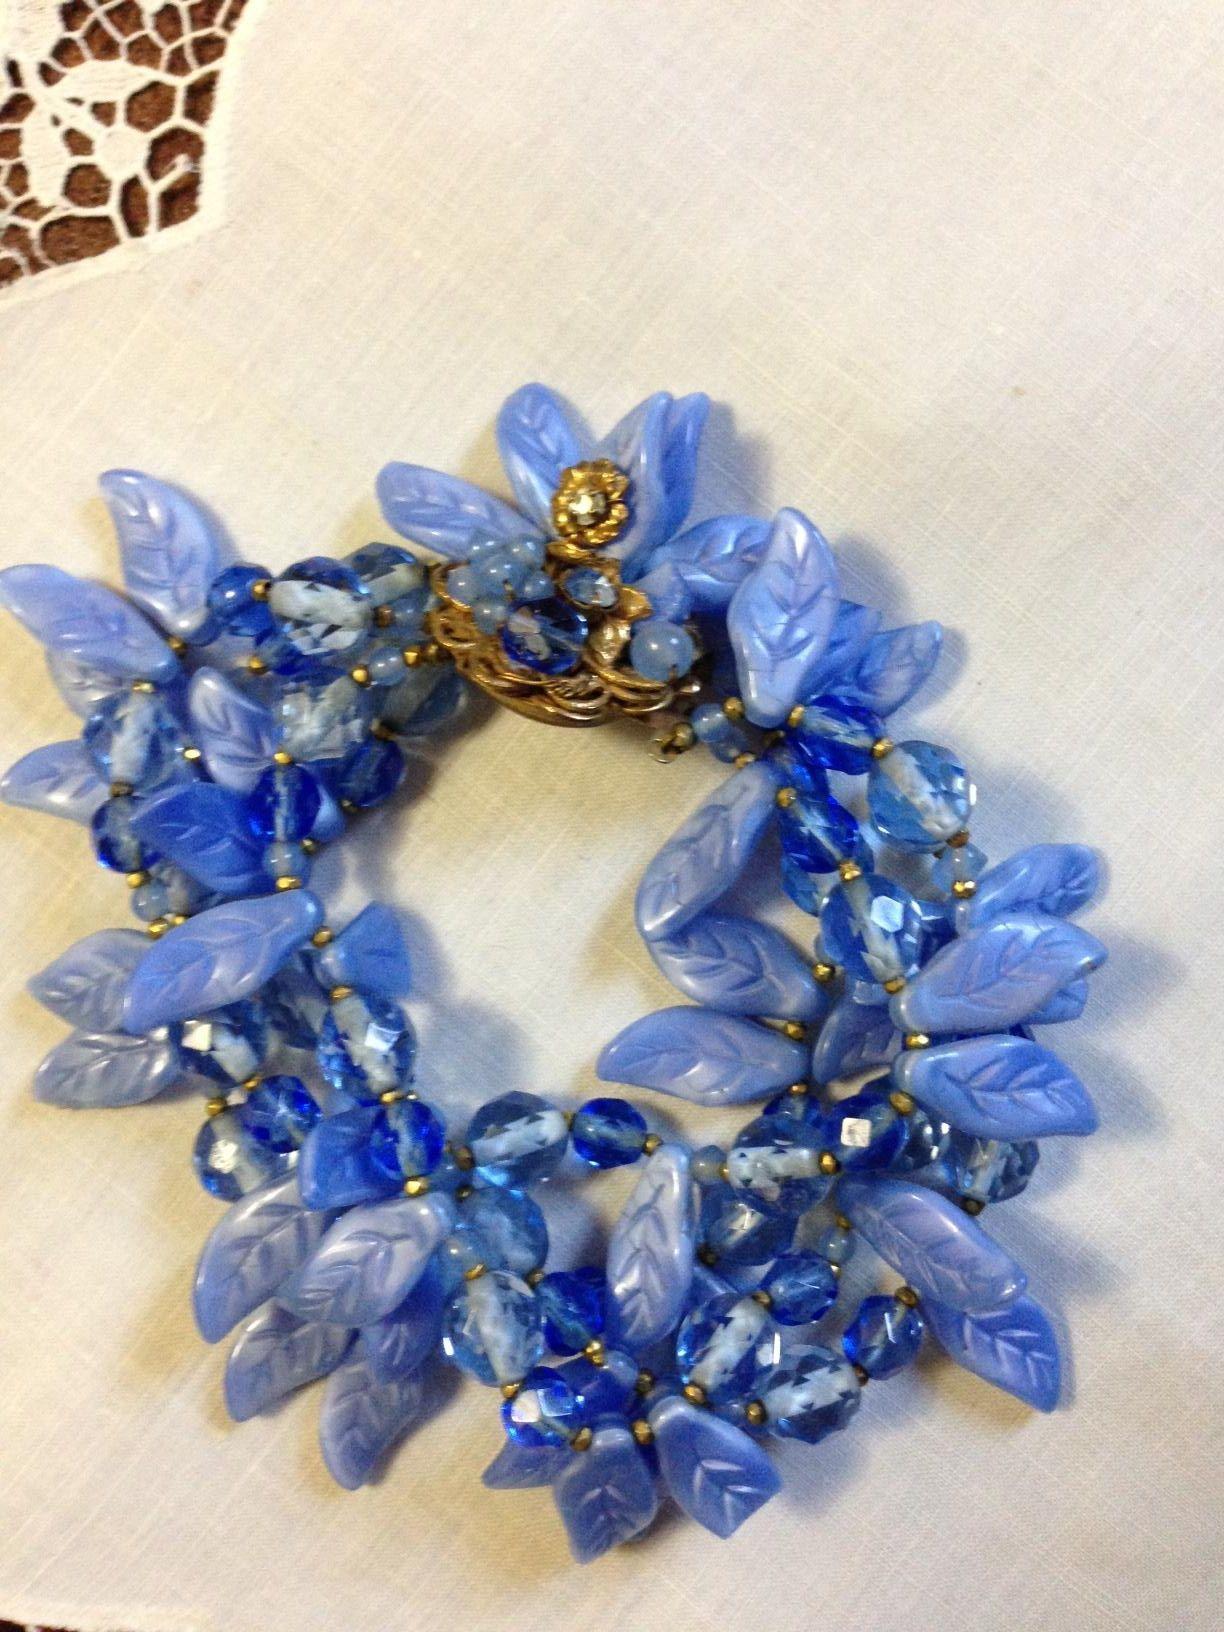 Robert DeMario Glass Bead/Leaf Bracelet